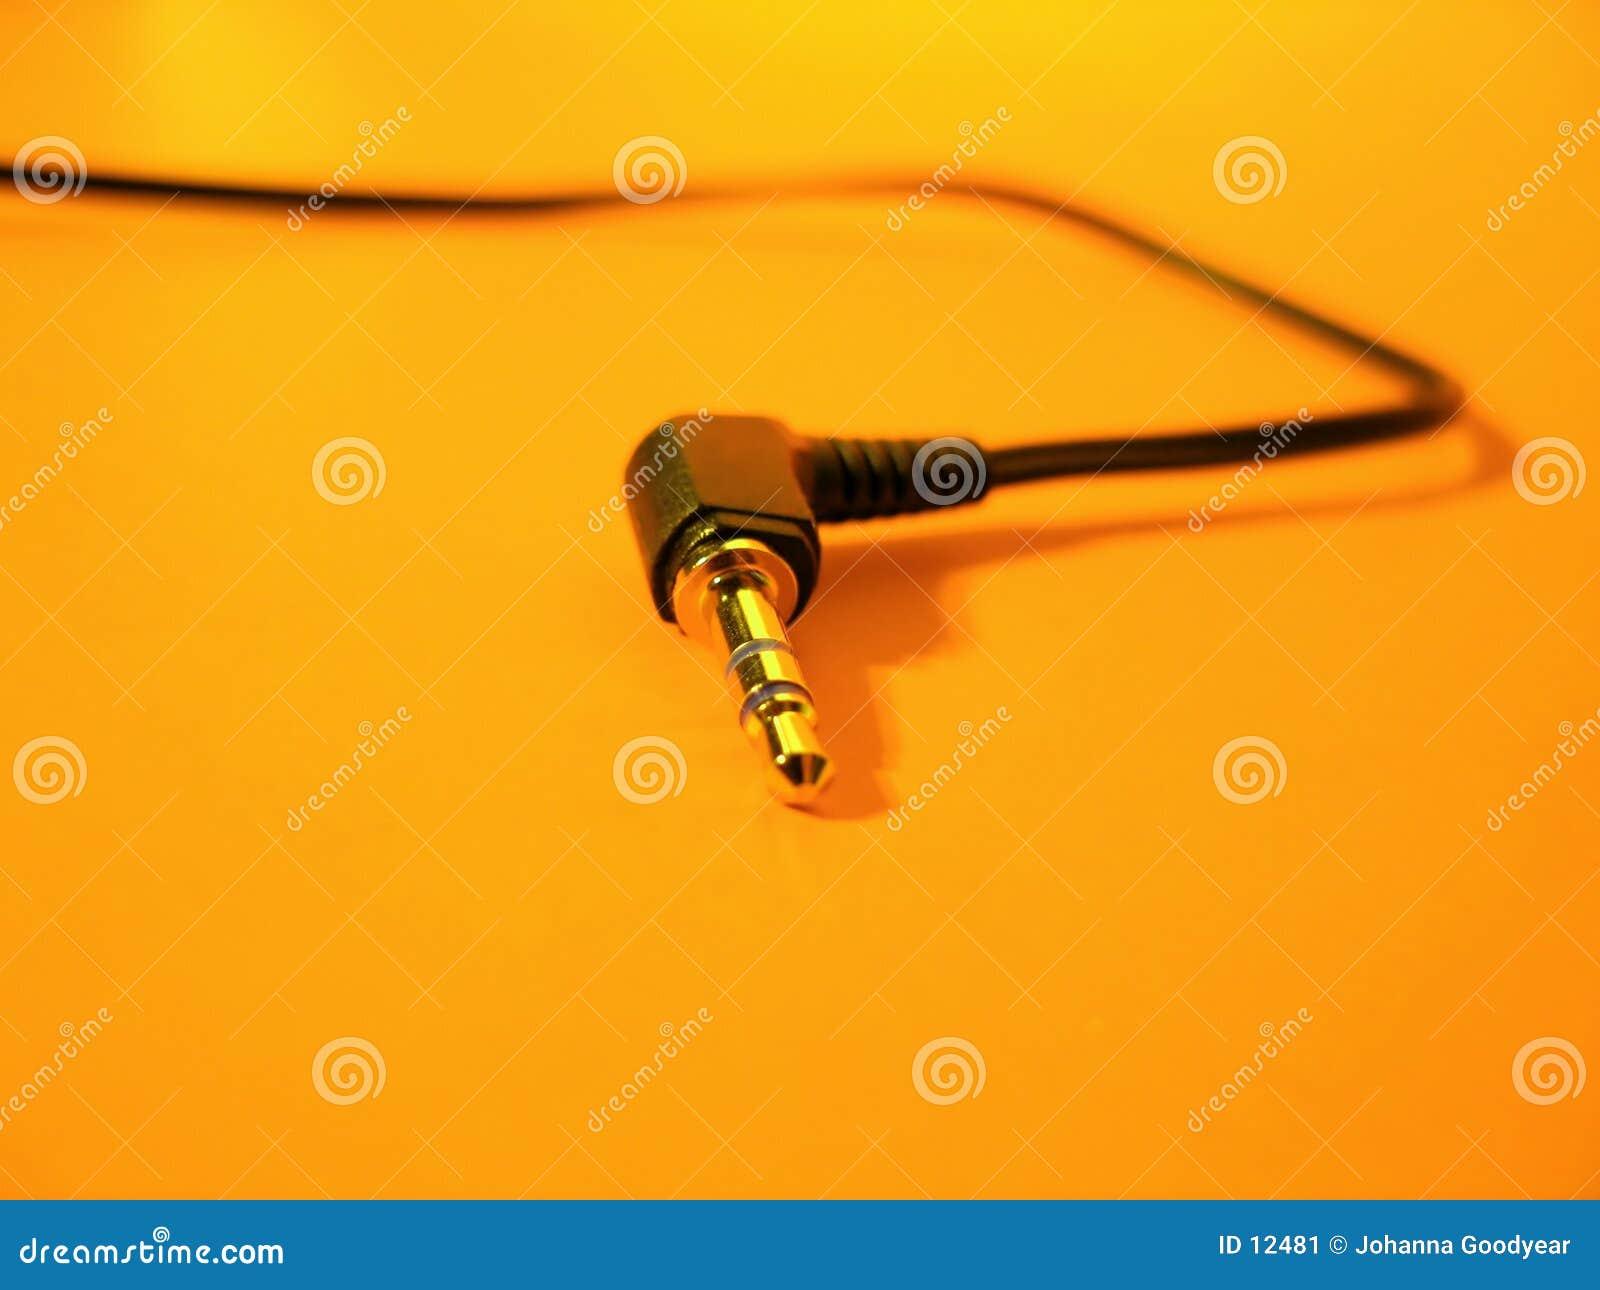 Headphone Cord